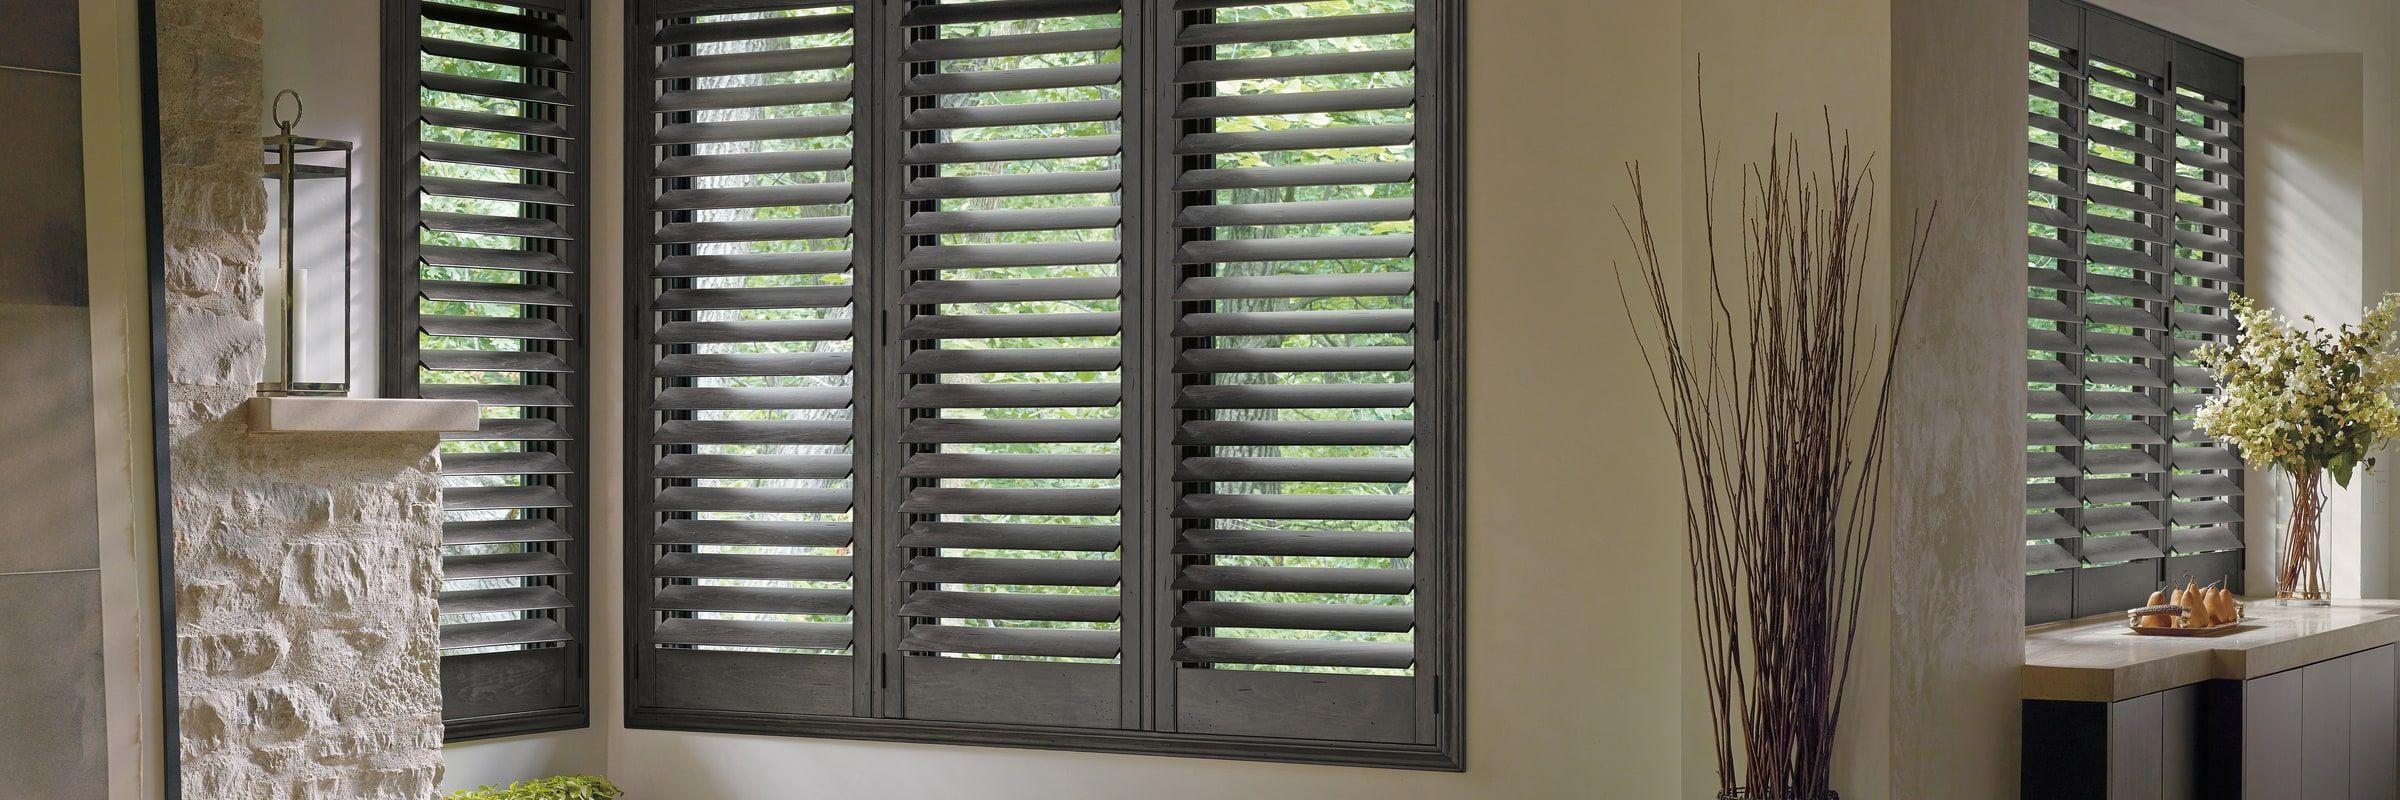 Wood Shutters Hardwood Shutters Heritance Hunter Douglas Custom Blinds Wood Shutters Window Treatments